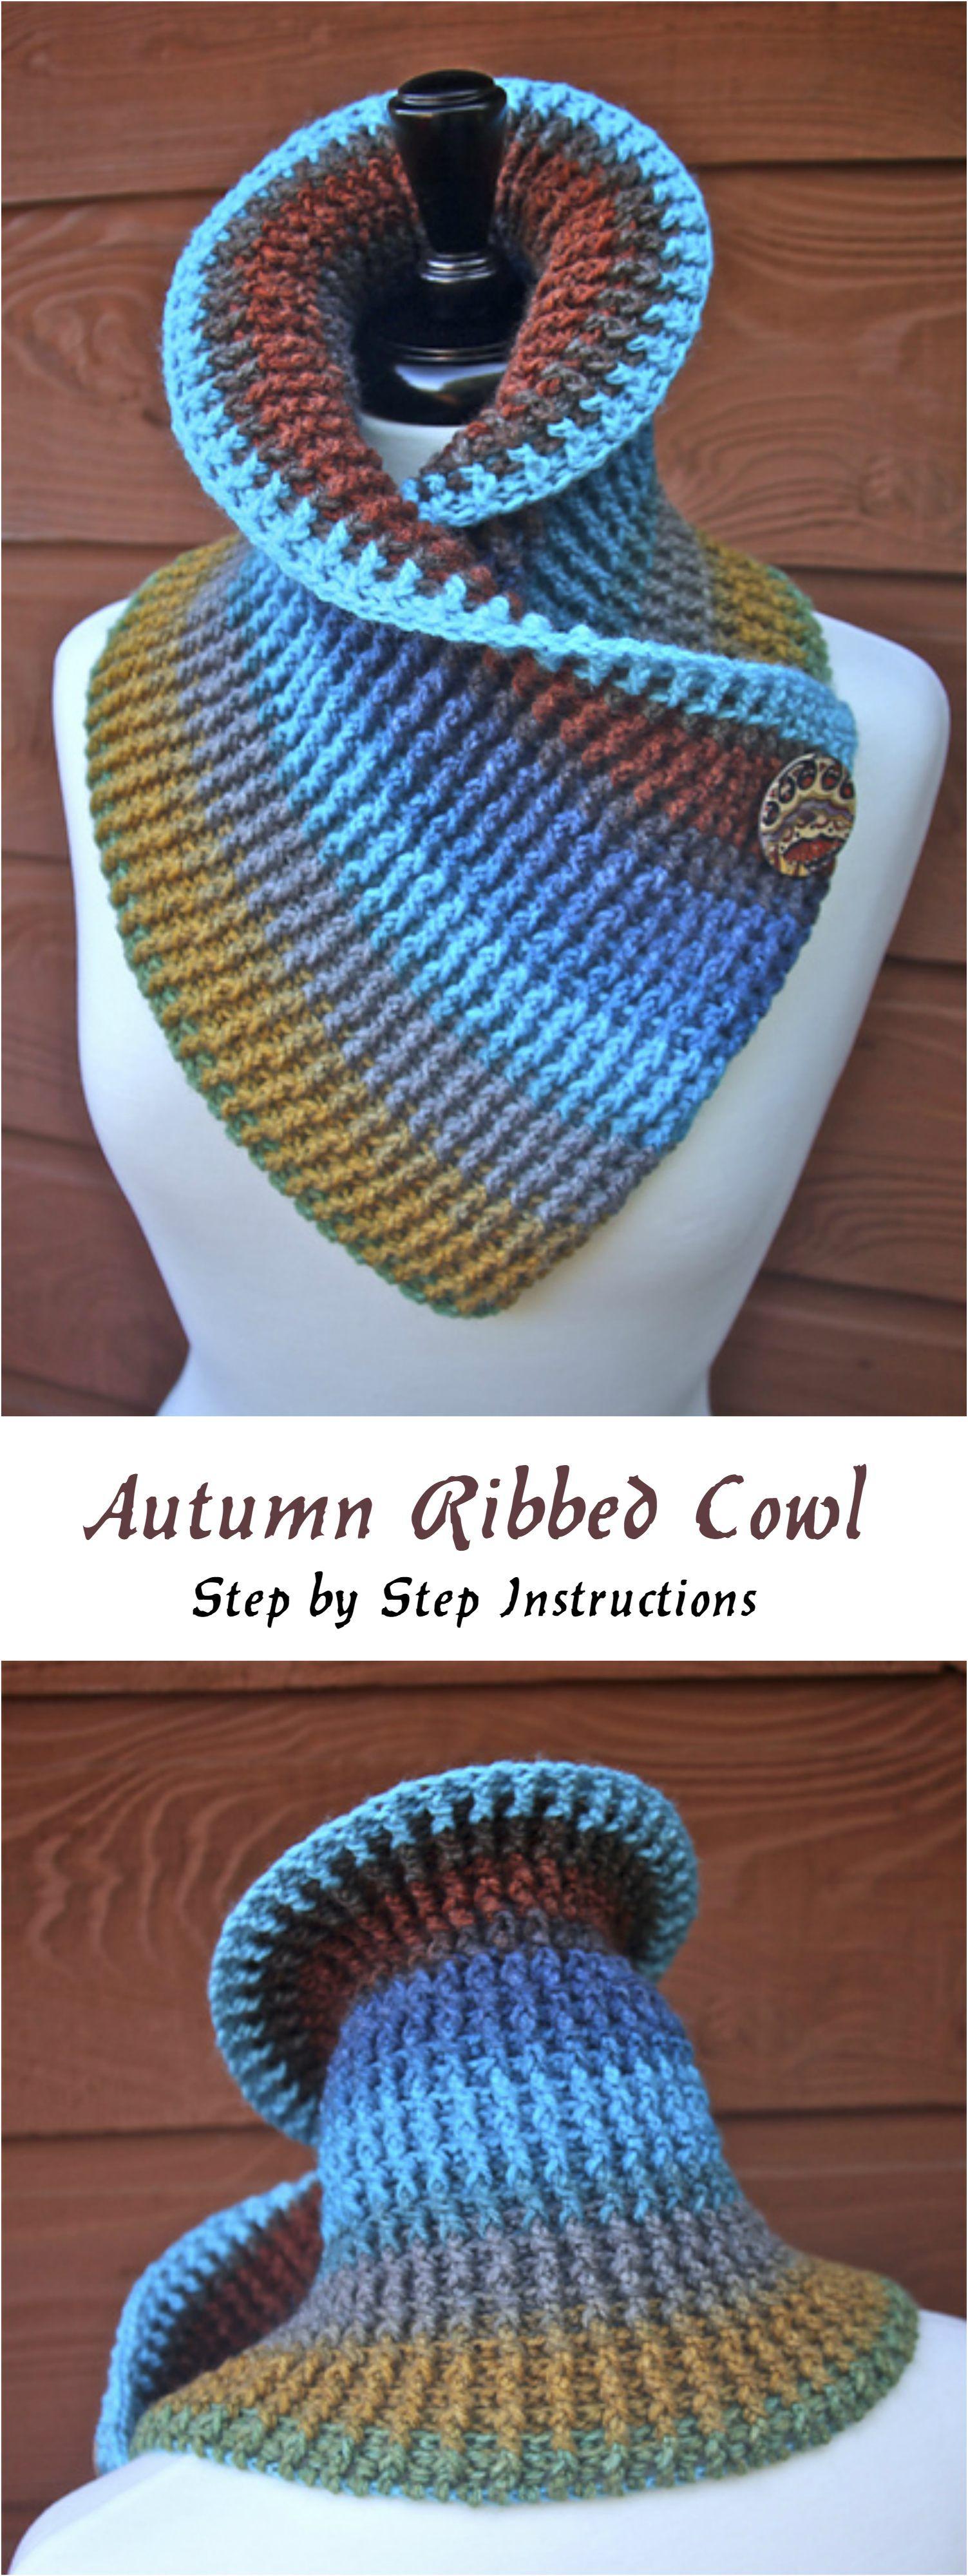 Crochet Autumn Ribbed Cowl   Manualidades inteligentes   Pinterest ...